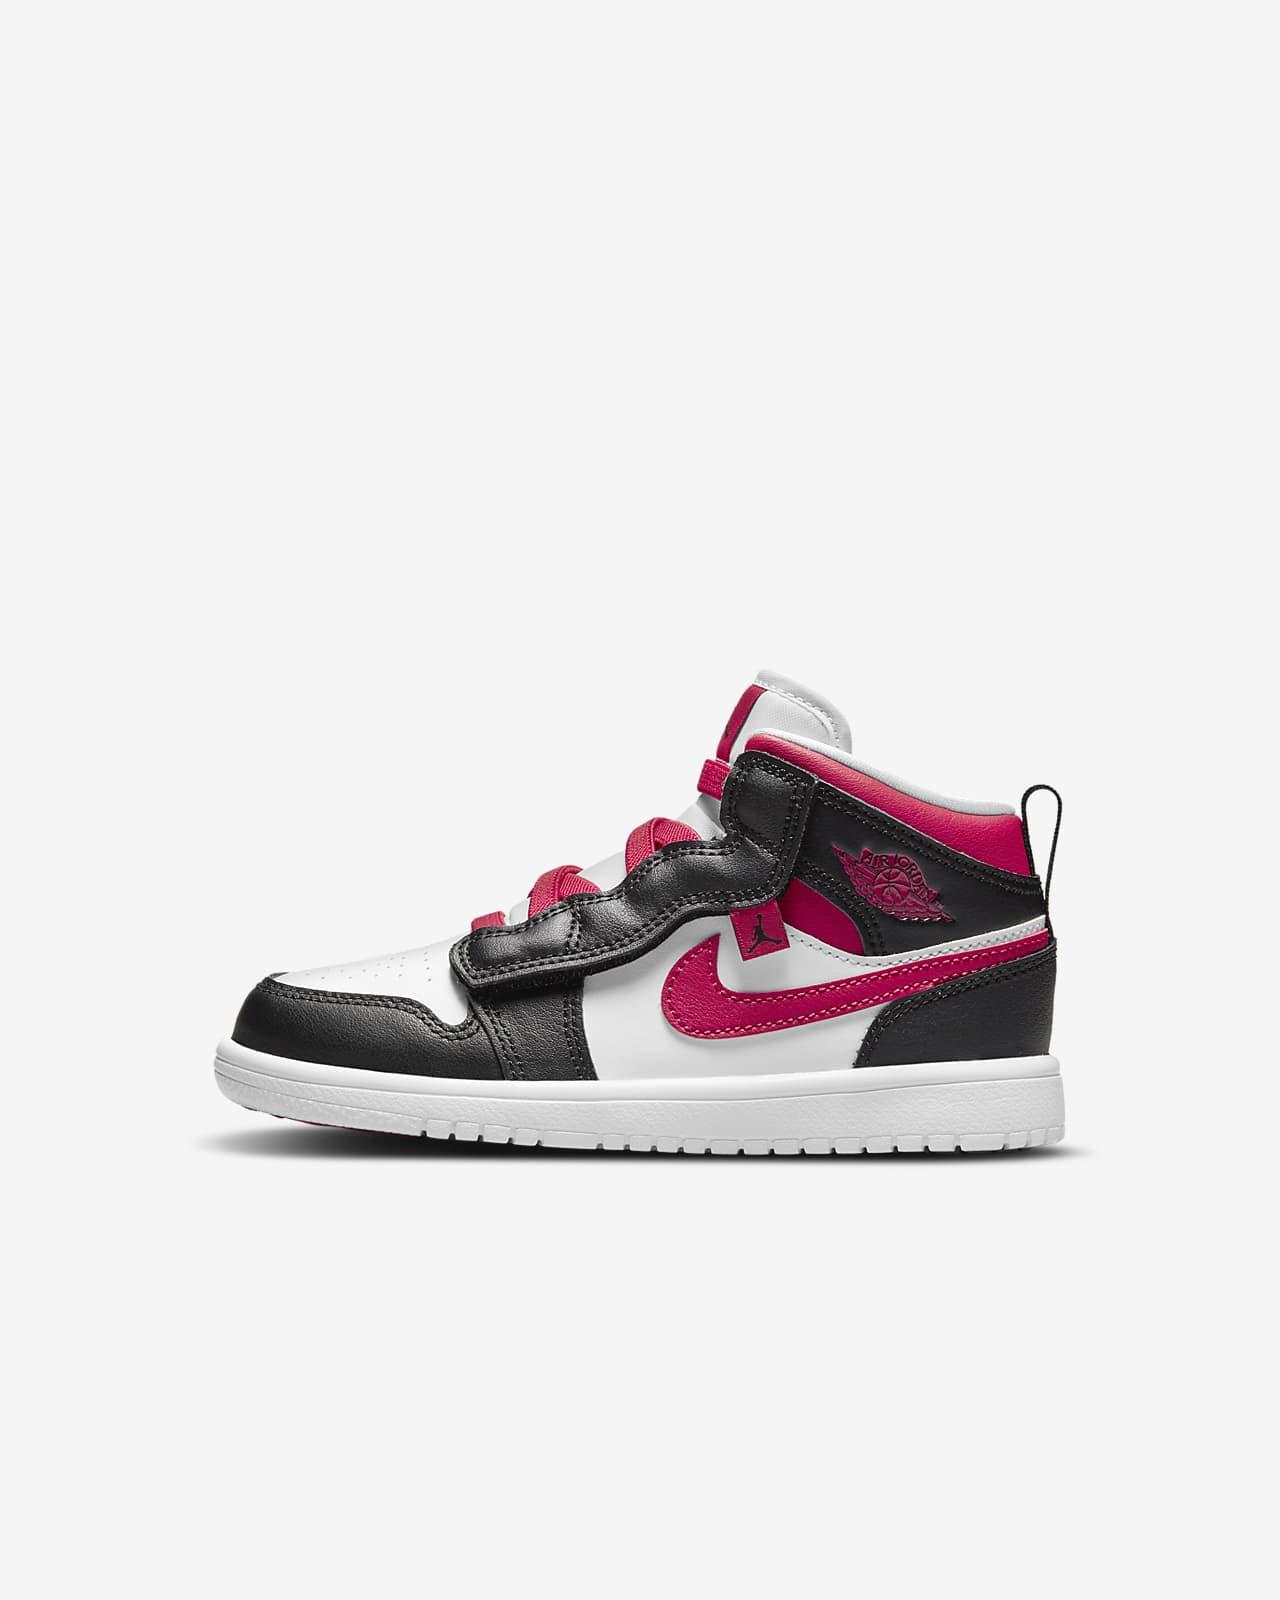 Jordan 1 中筒小童鞋款